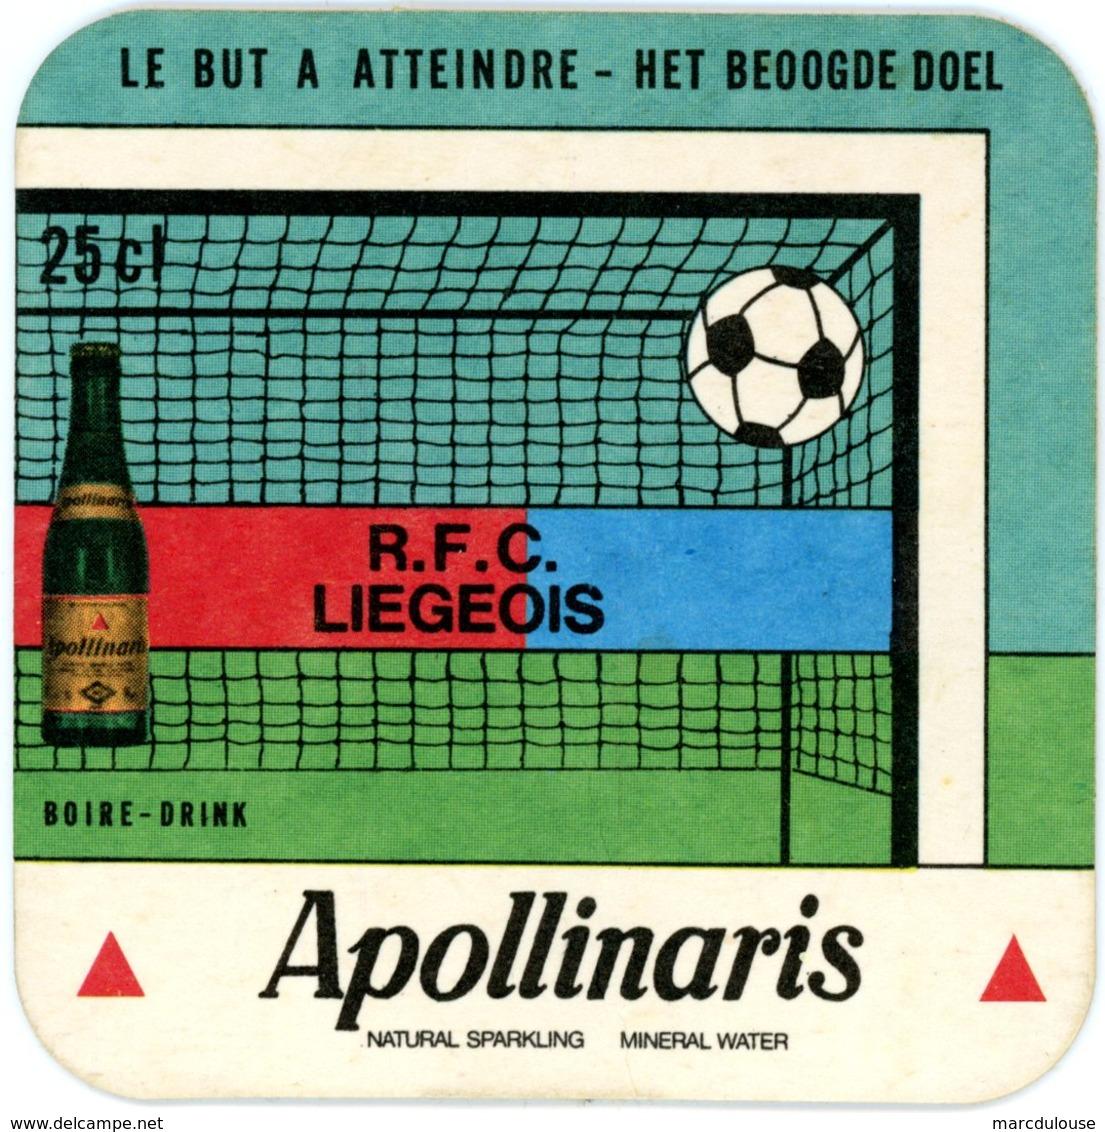 Apollinaris. Natural Sparkling Mineral Water. R.F.C. Liégeois. Football. Le But à Atteindre. Het Beoogde Doel. Boire. - Sous-bocks